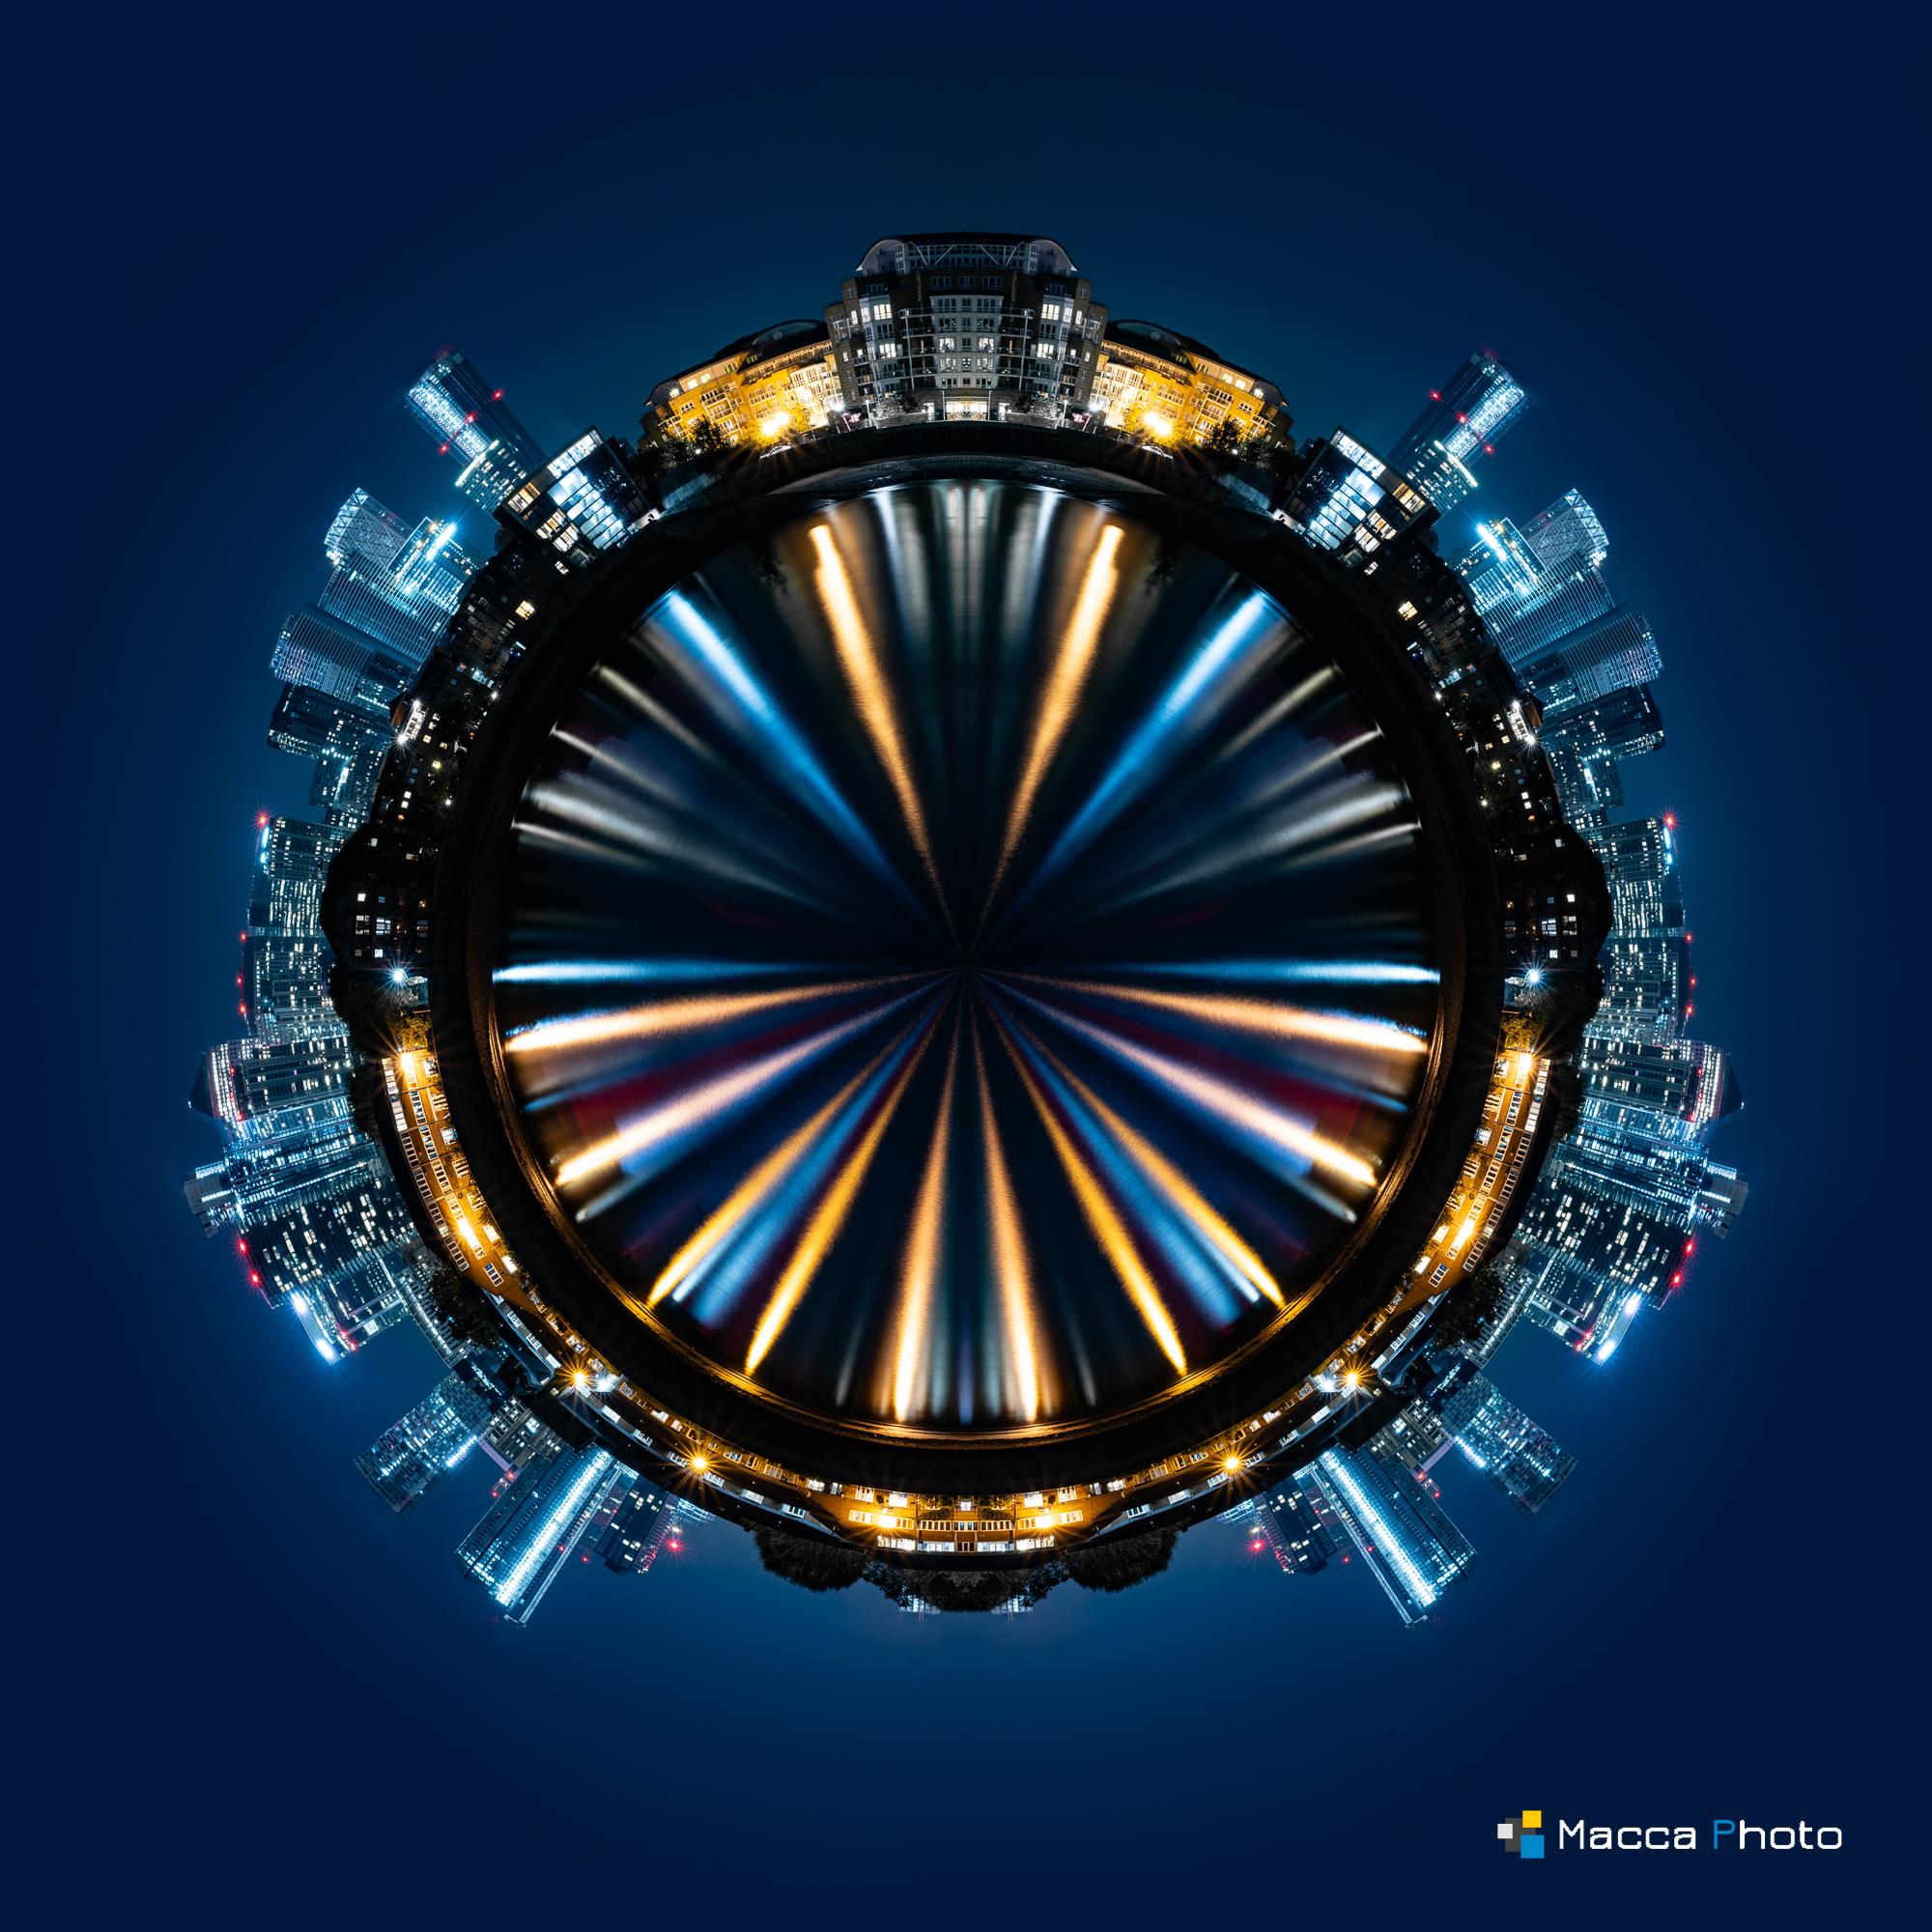 Mini Planet - London - Canary Wharf